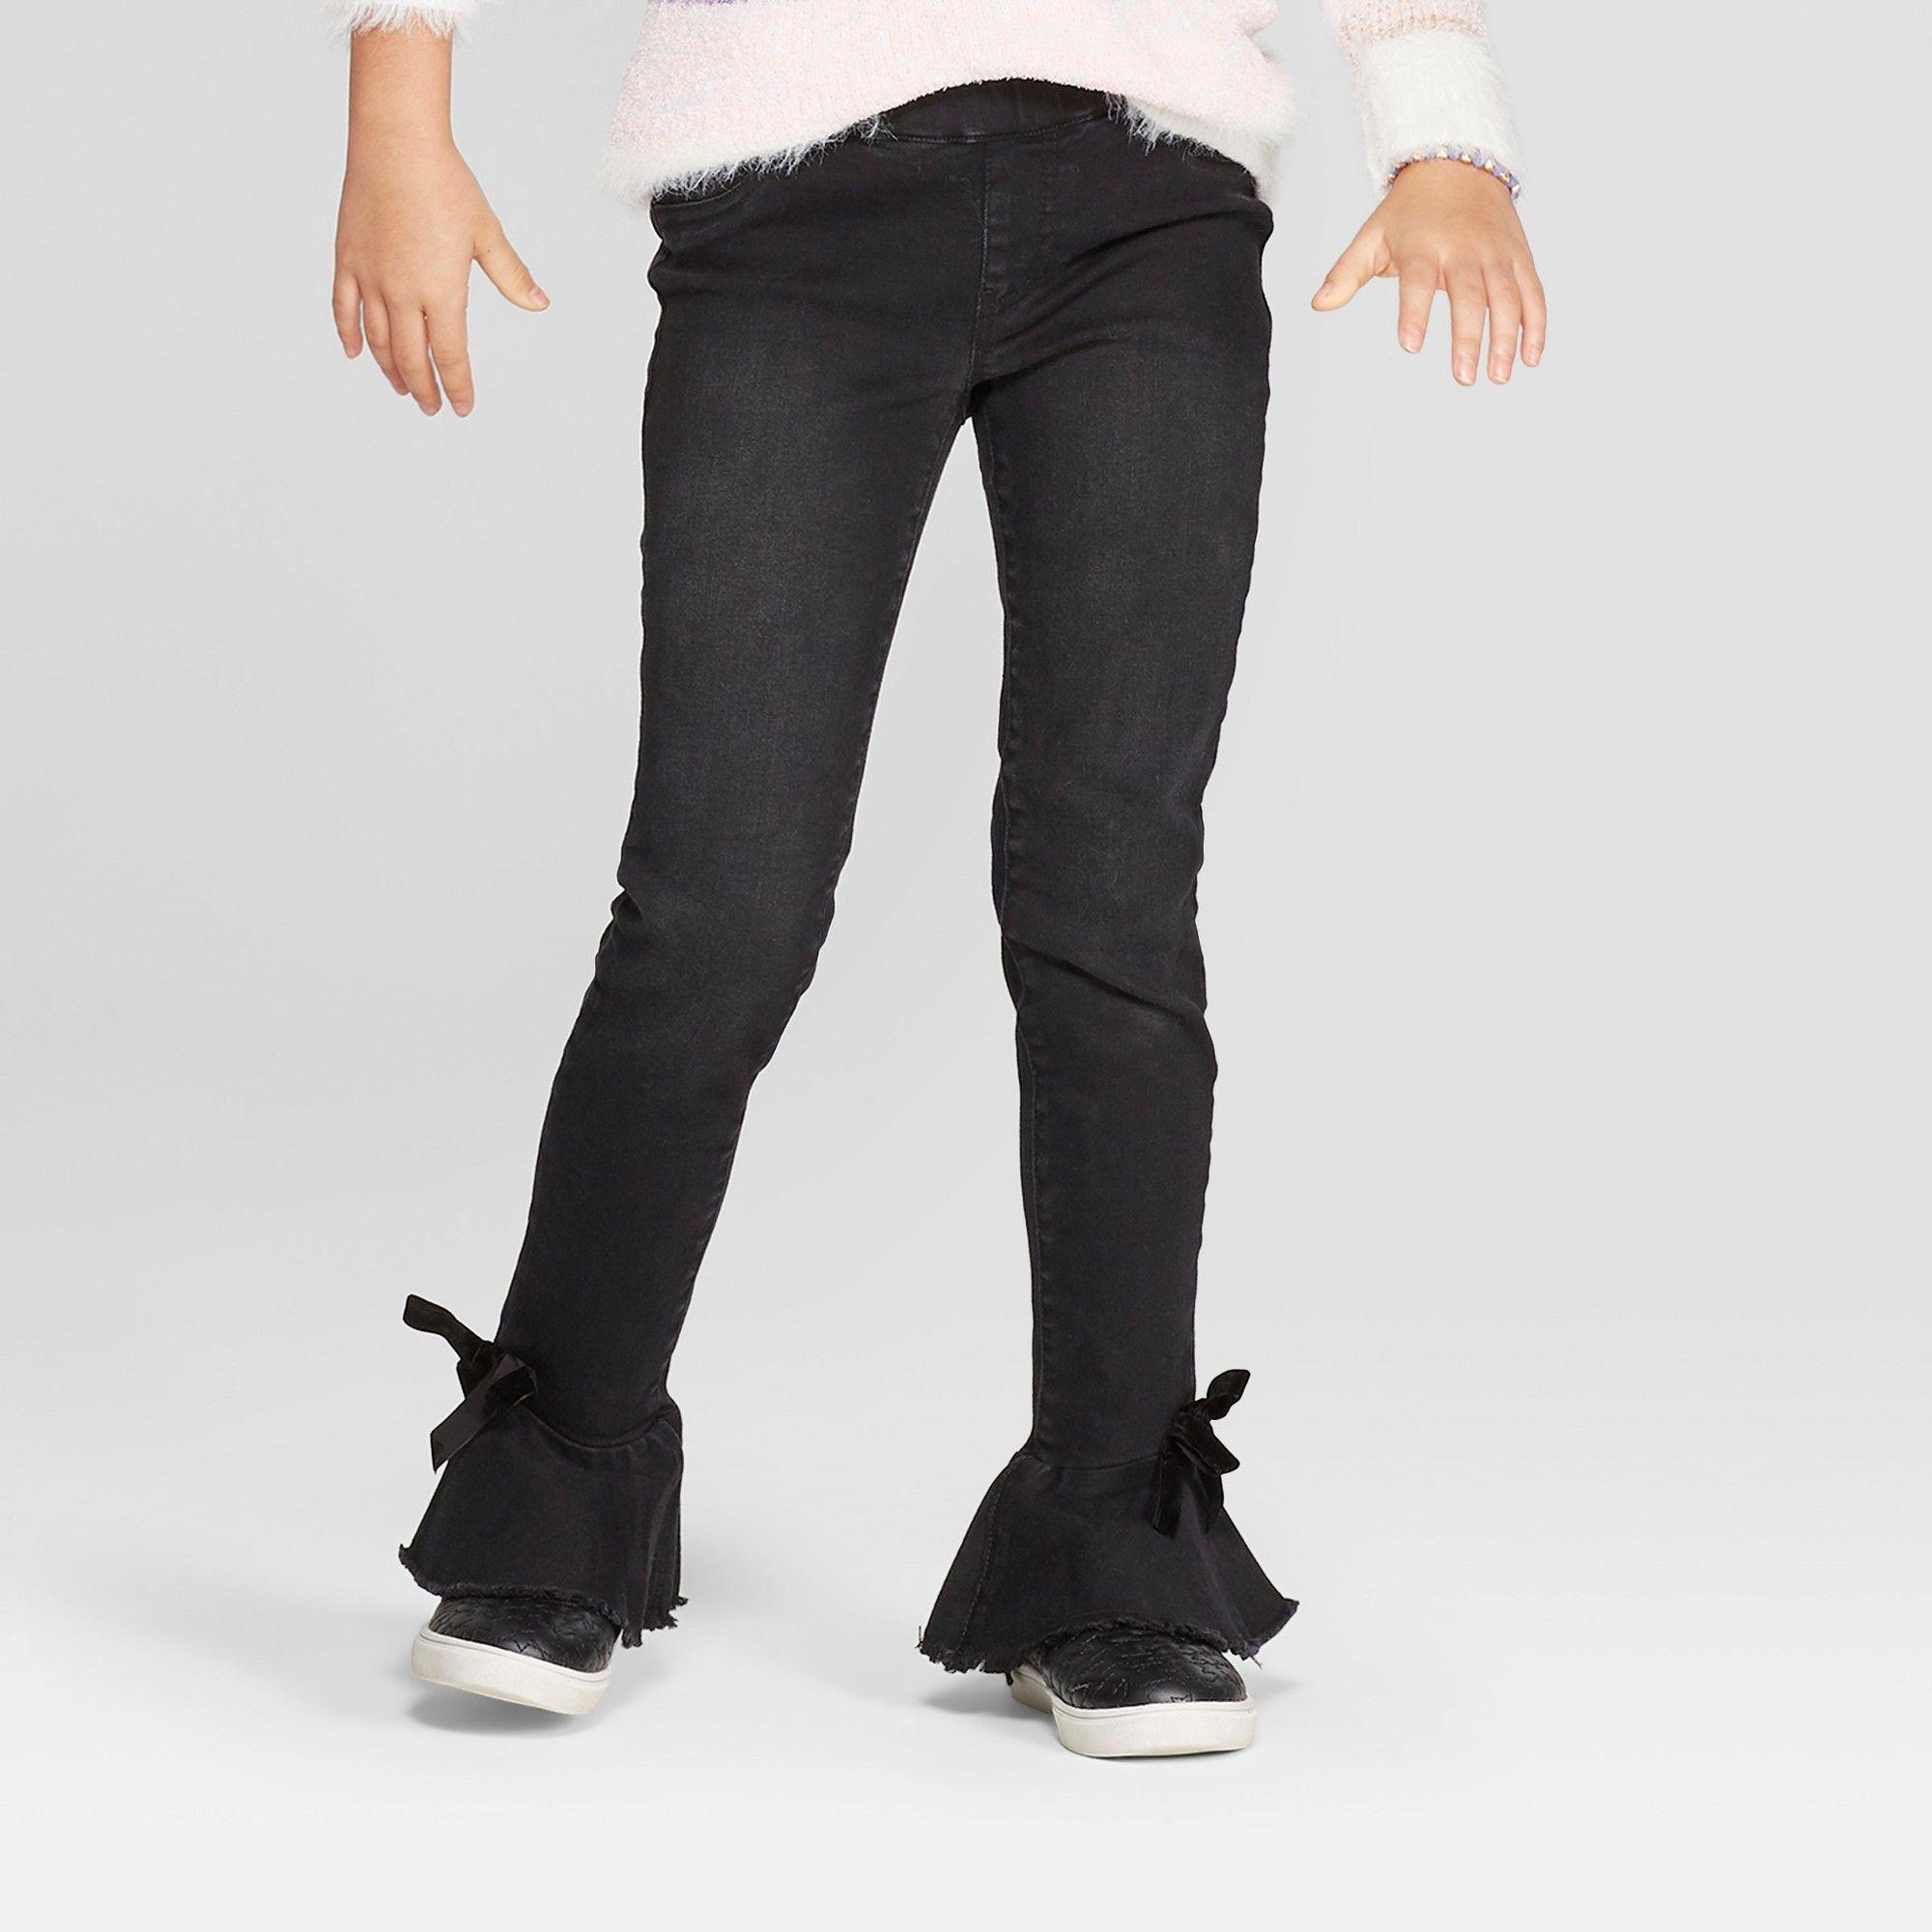 fad244efe Girls' Pull-On Ruffle Bottom Jeans - Cat & Jack Black 10 Slim | Products